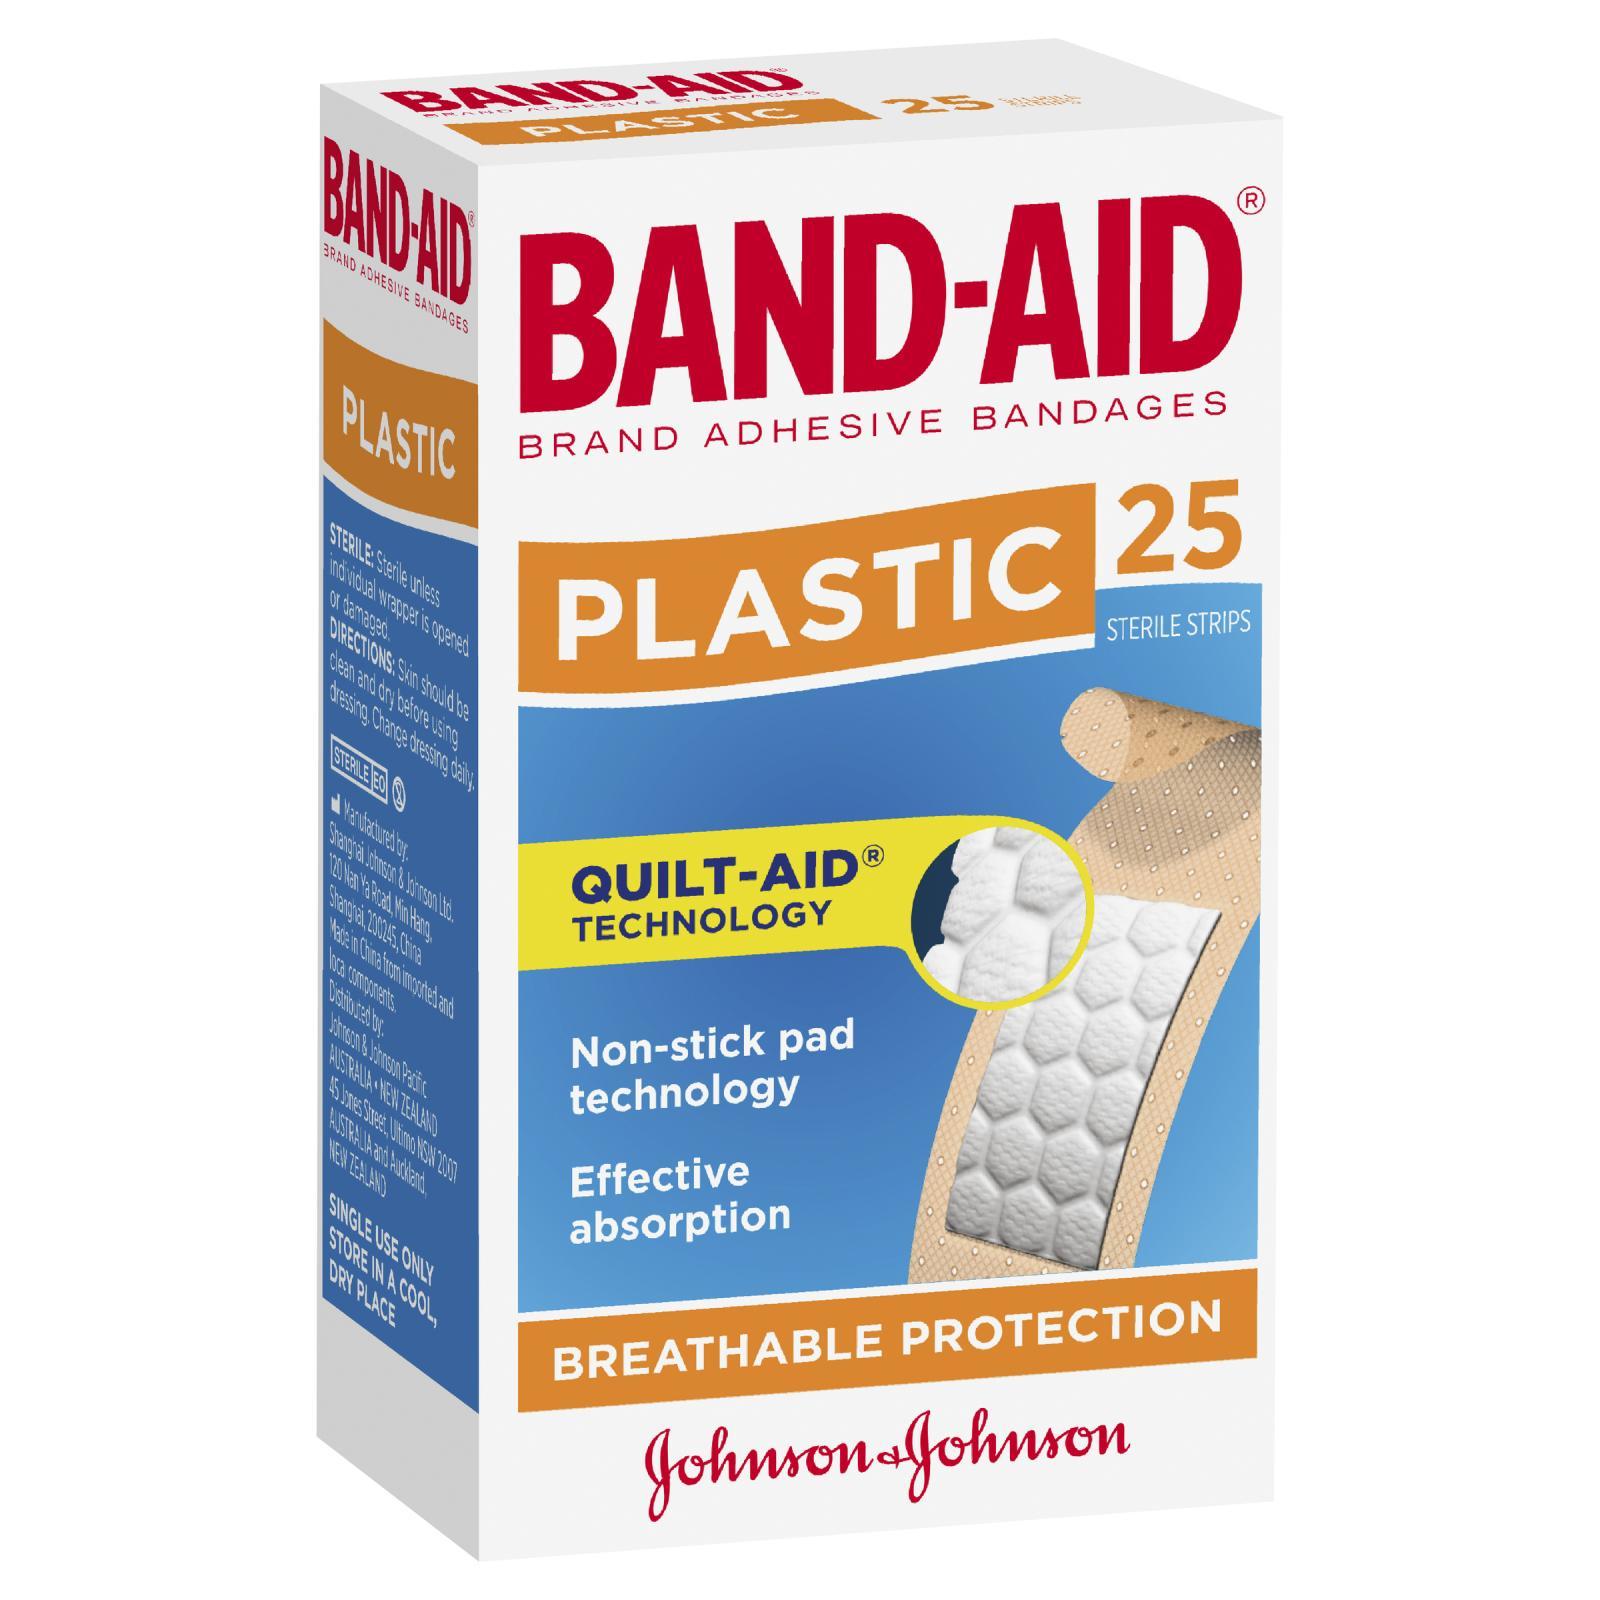 Band-Aid Plastic Contoured Shape 25 Strips